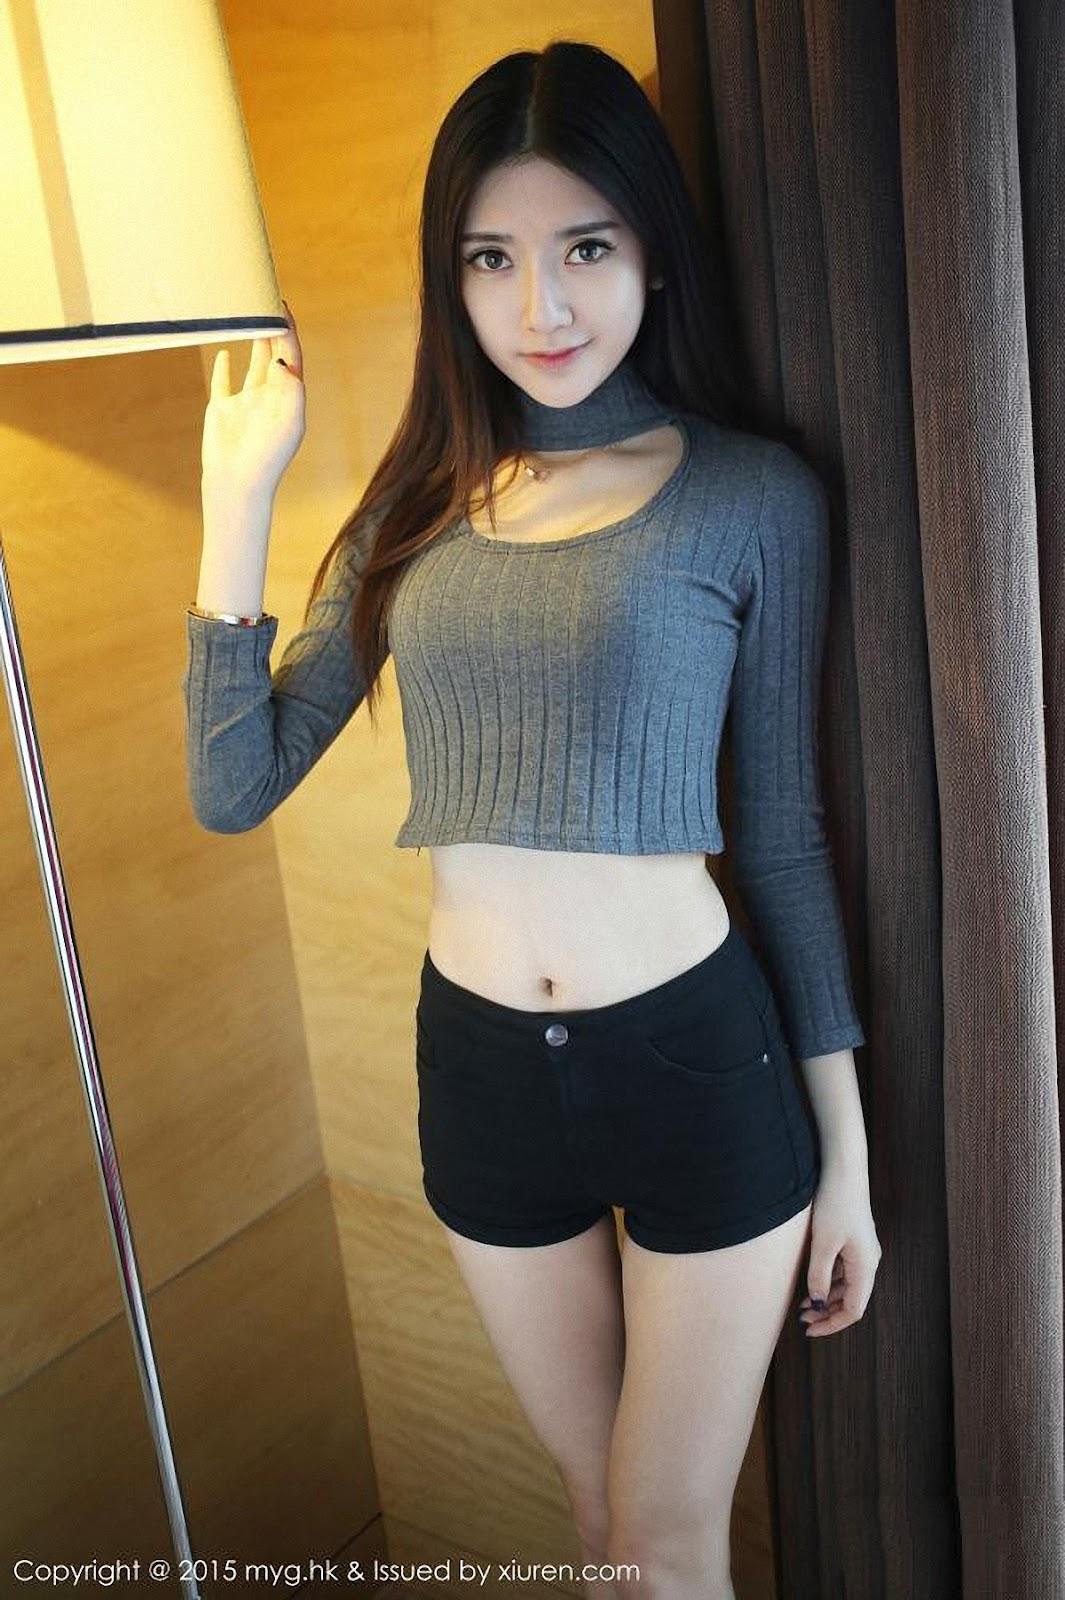 21 - Sexy Girl Model MYGIRL VOL.119